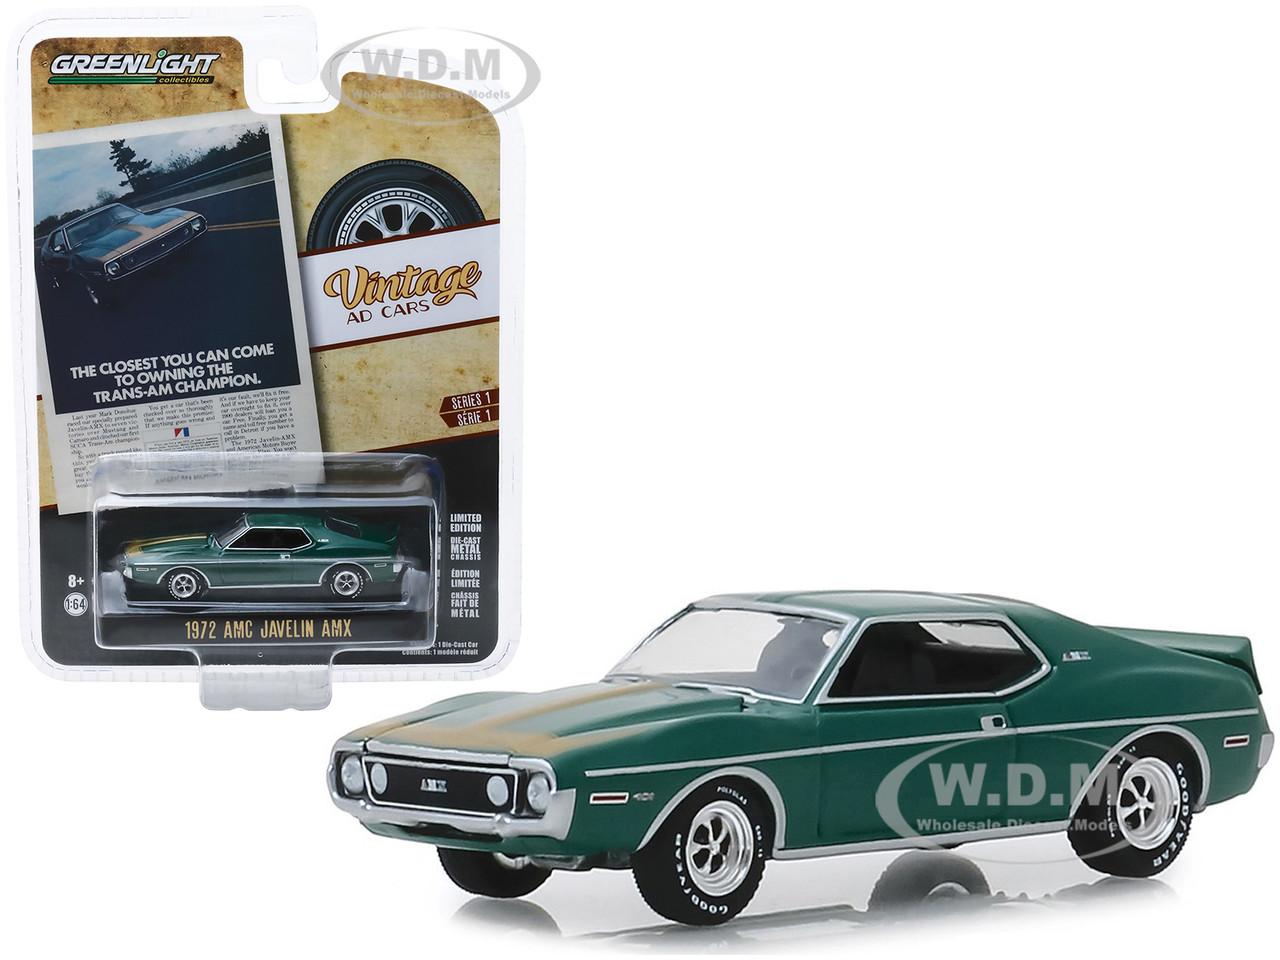 Greenlight 1:64 Vintage AD Cars Series 1 1972 Ford Ranchero Diecast Car 39020-E